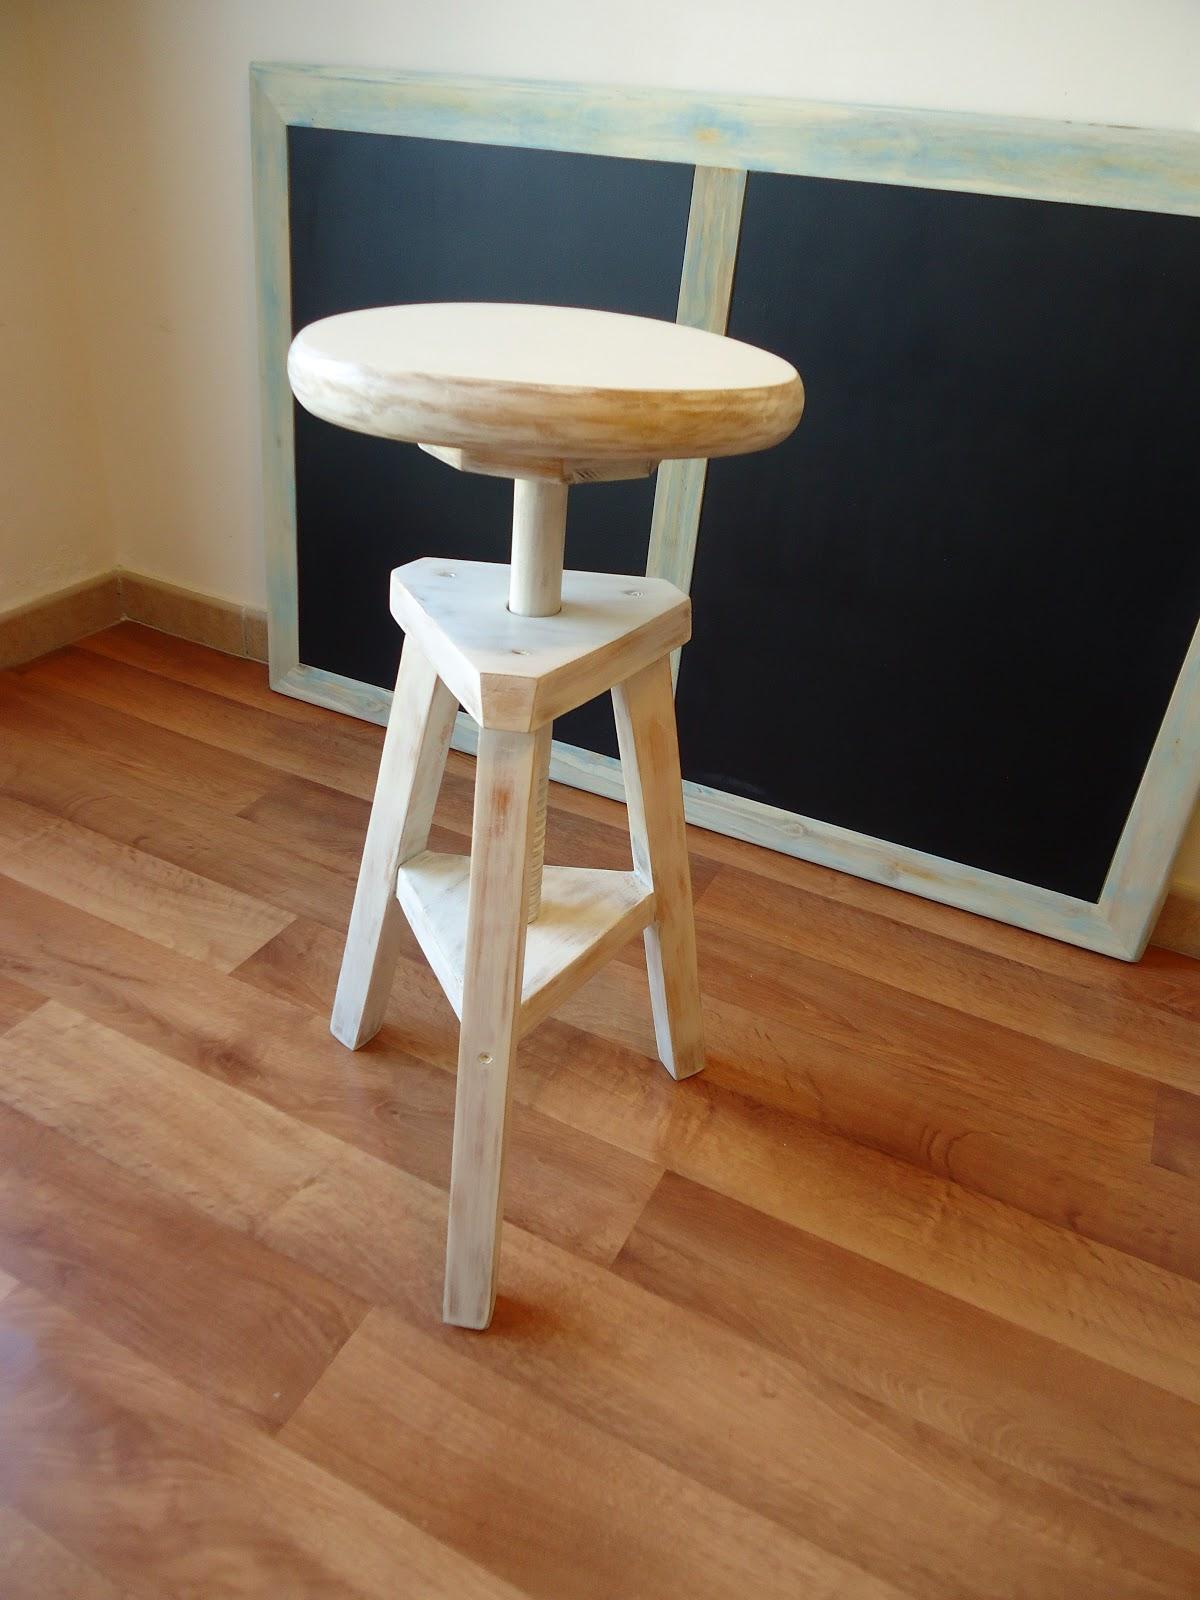 Taburete pintor blanco decap vendido - Taburete madera regulable ...